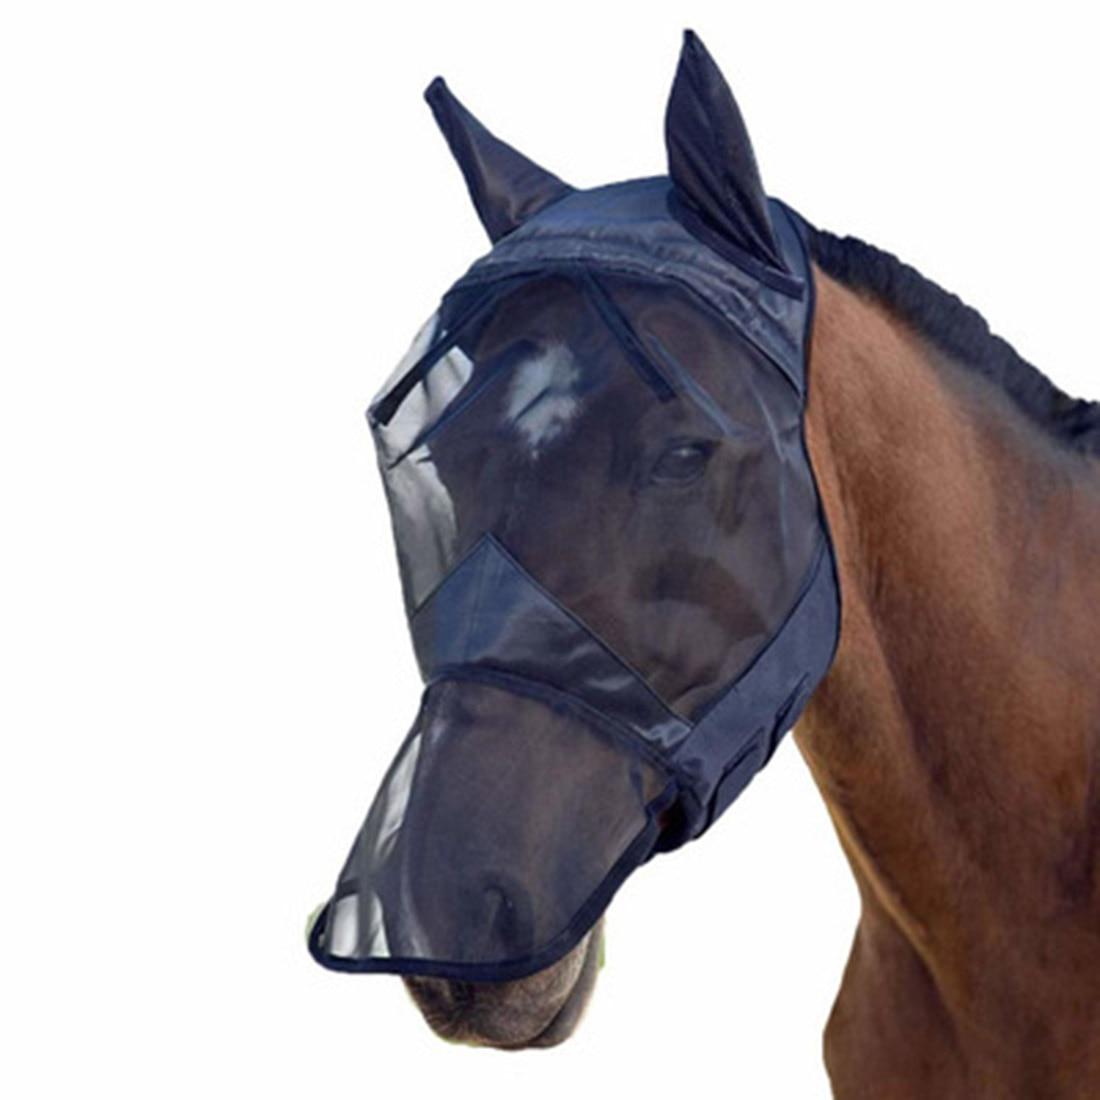 Outdoor Horse Fly Mask Hood Full Face Mesh Fleece Padded Anti-UV Breathable  High Quality  Equipment For Horse